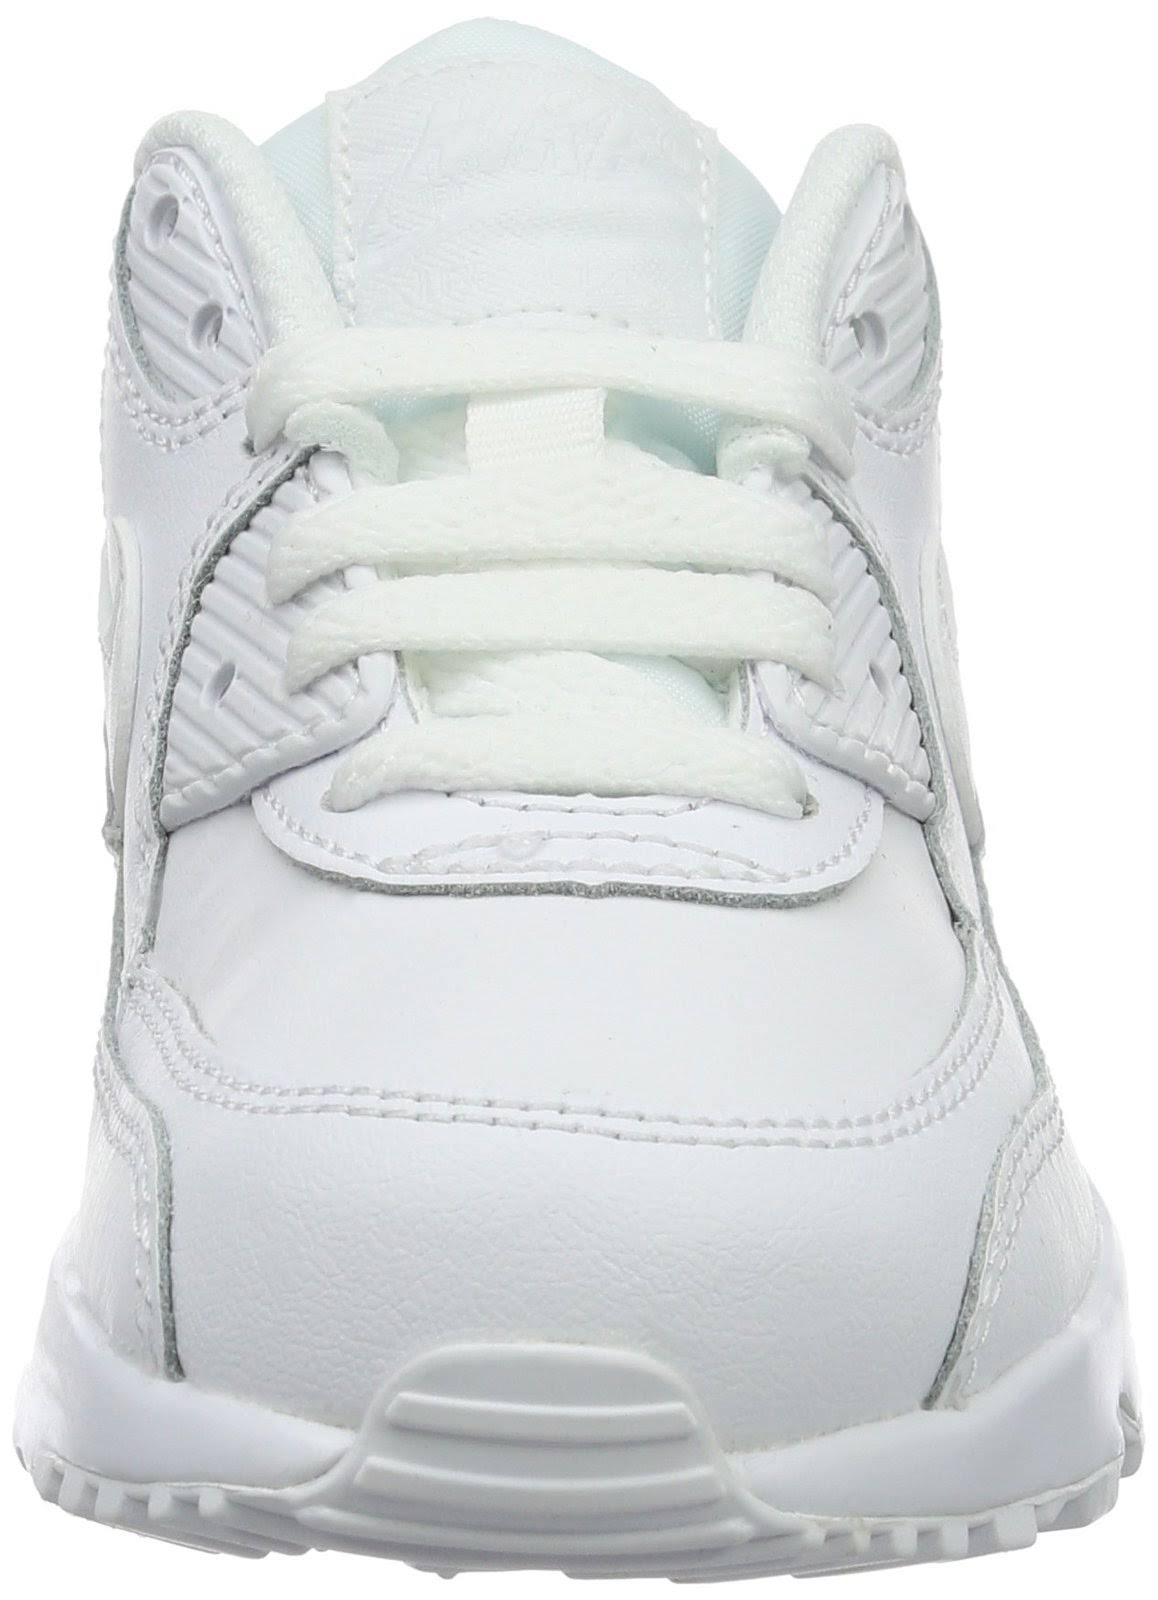 Nike Nike Nike Max Air 90 Max LtrpsBianco 90 LtrpsBianco Air bYyfv76g